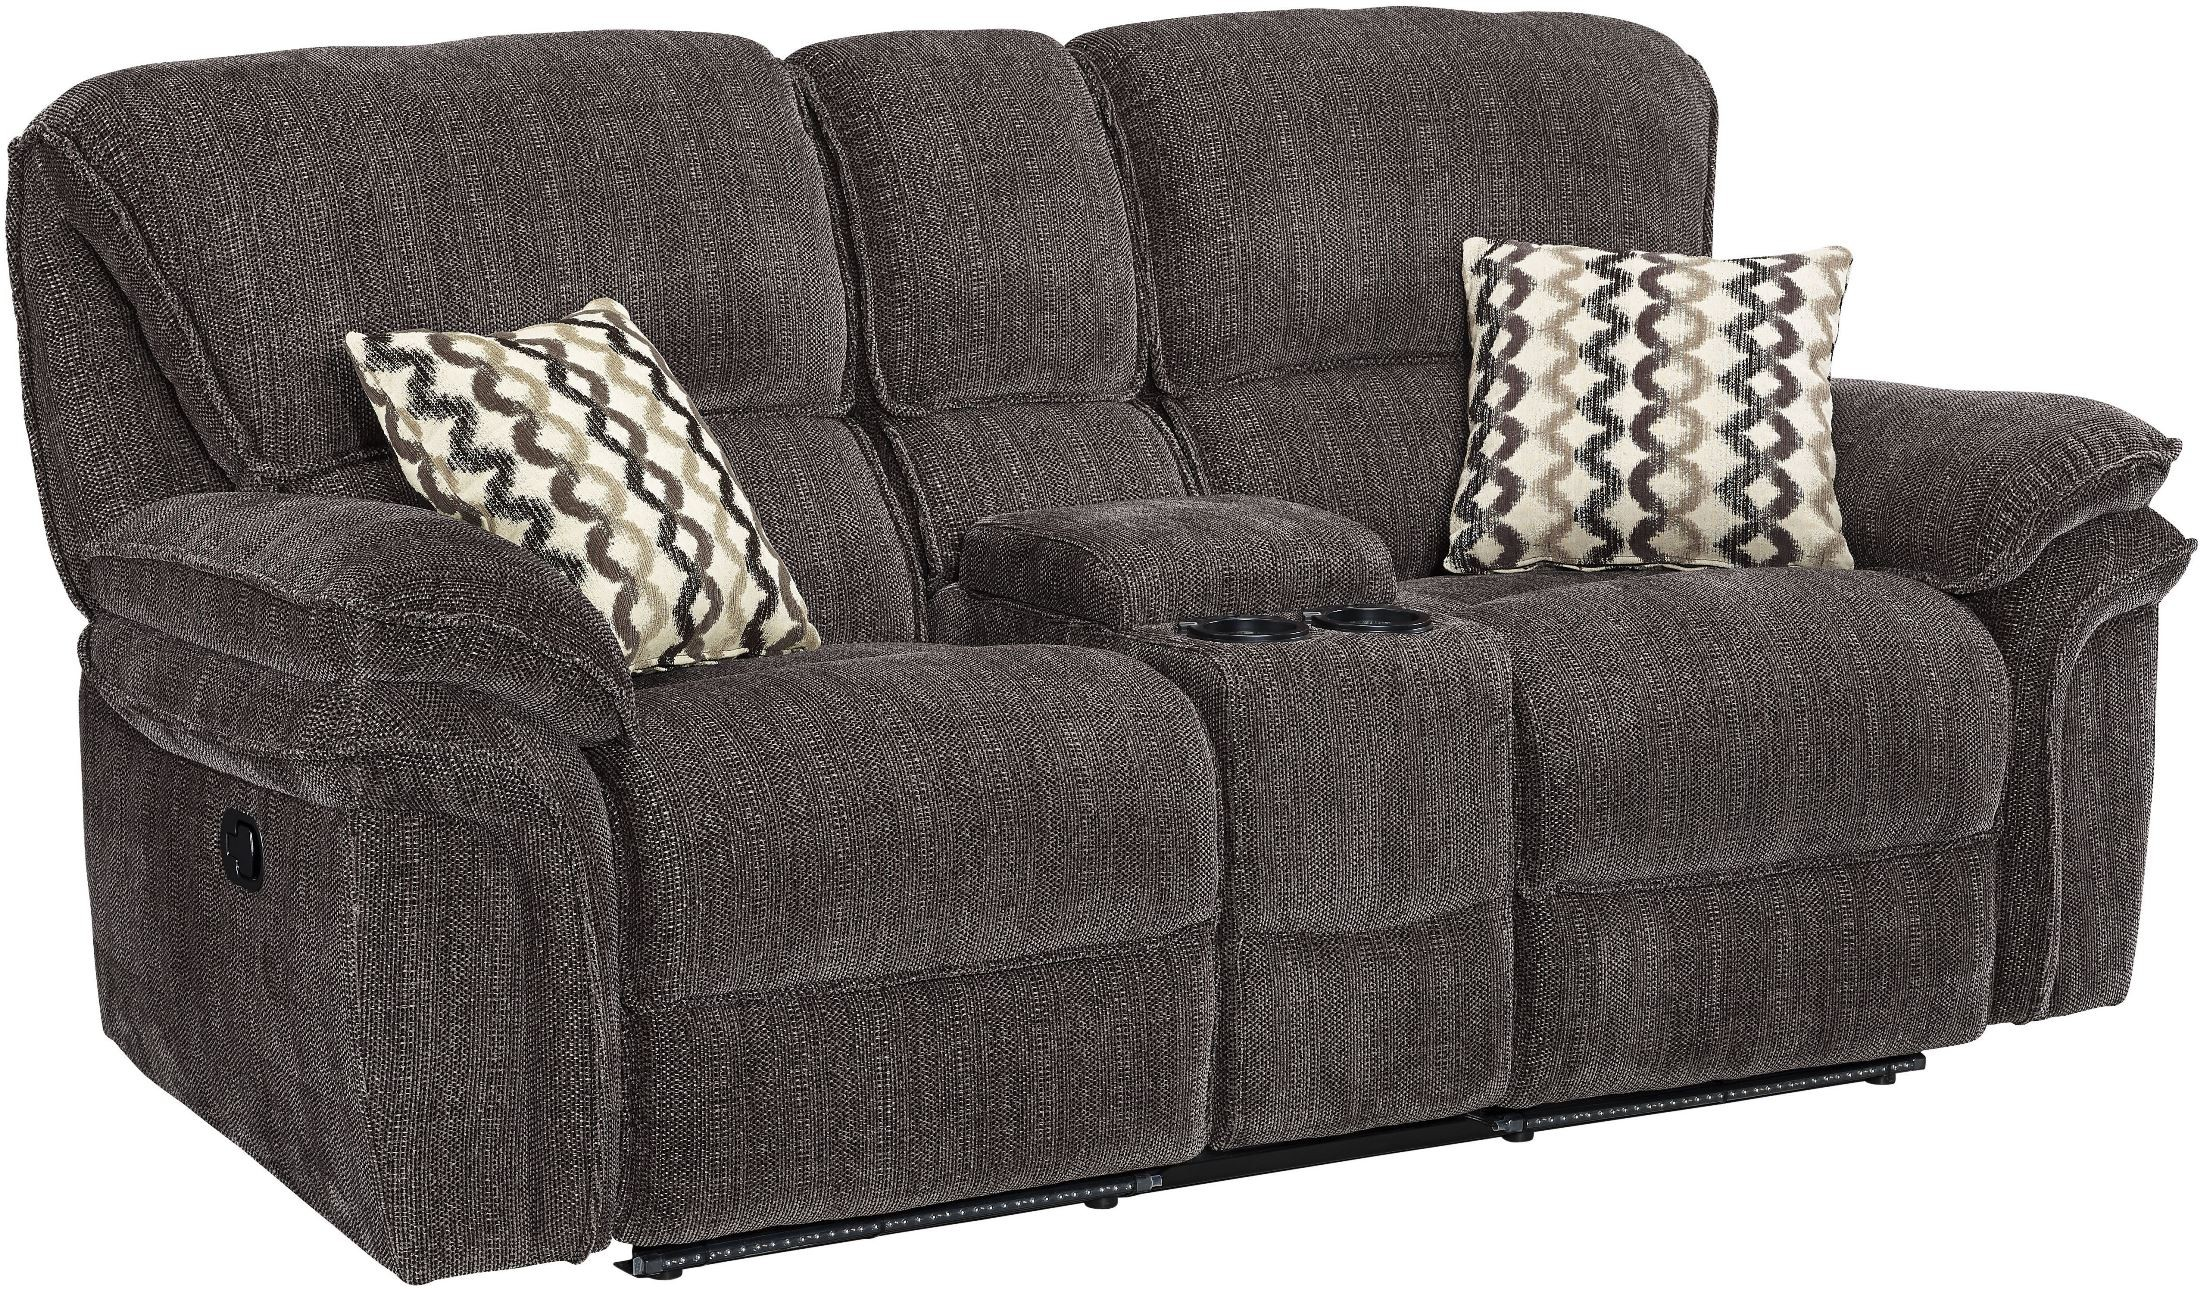 Furniture Sofa Set Price